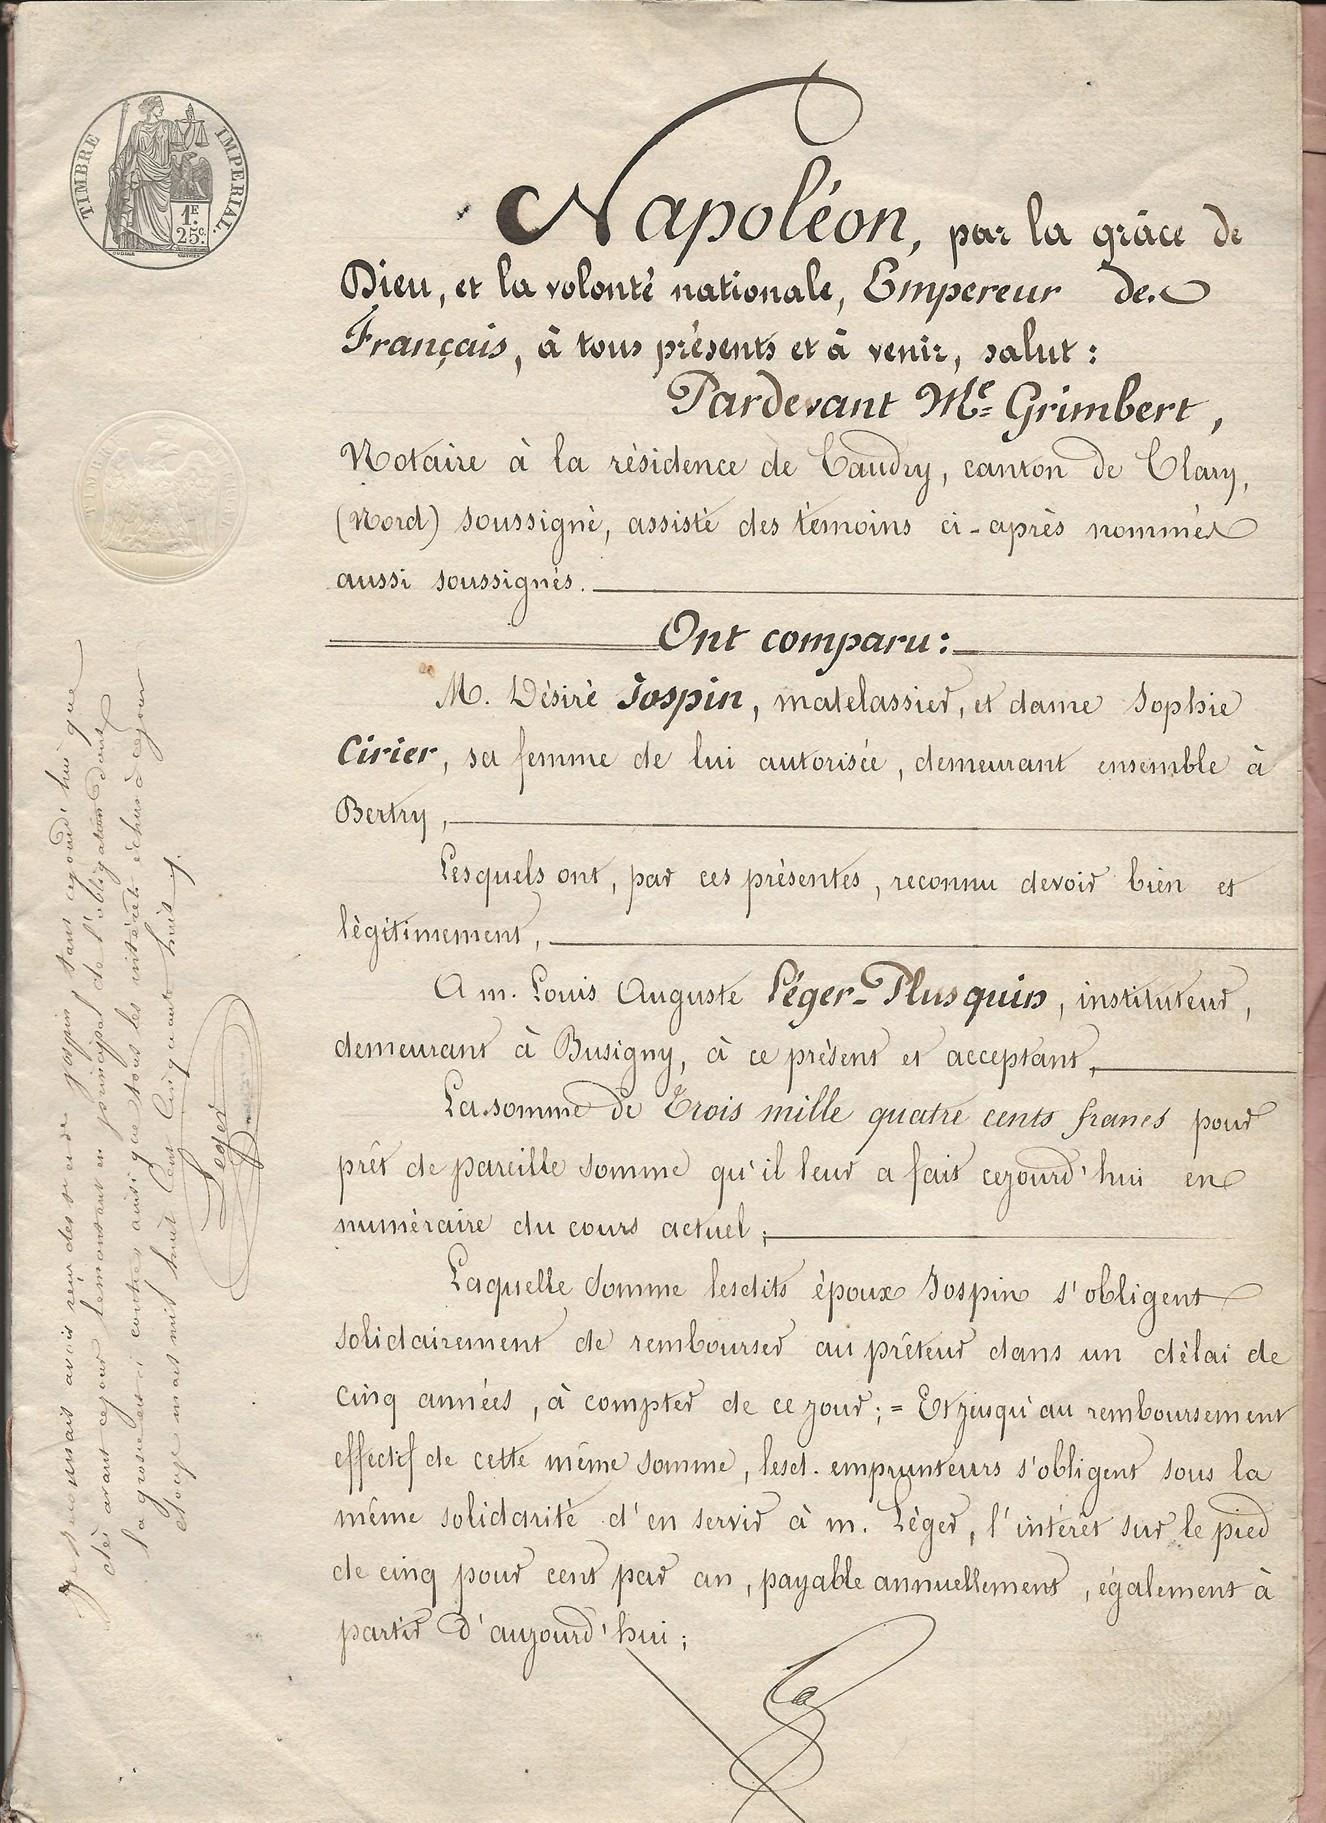 1854 emprunt hypothecaire jospin a leger plusquin 001